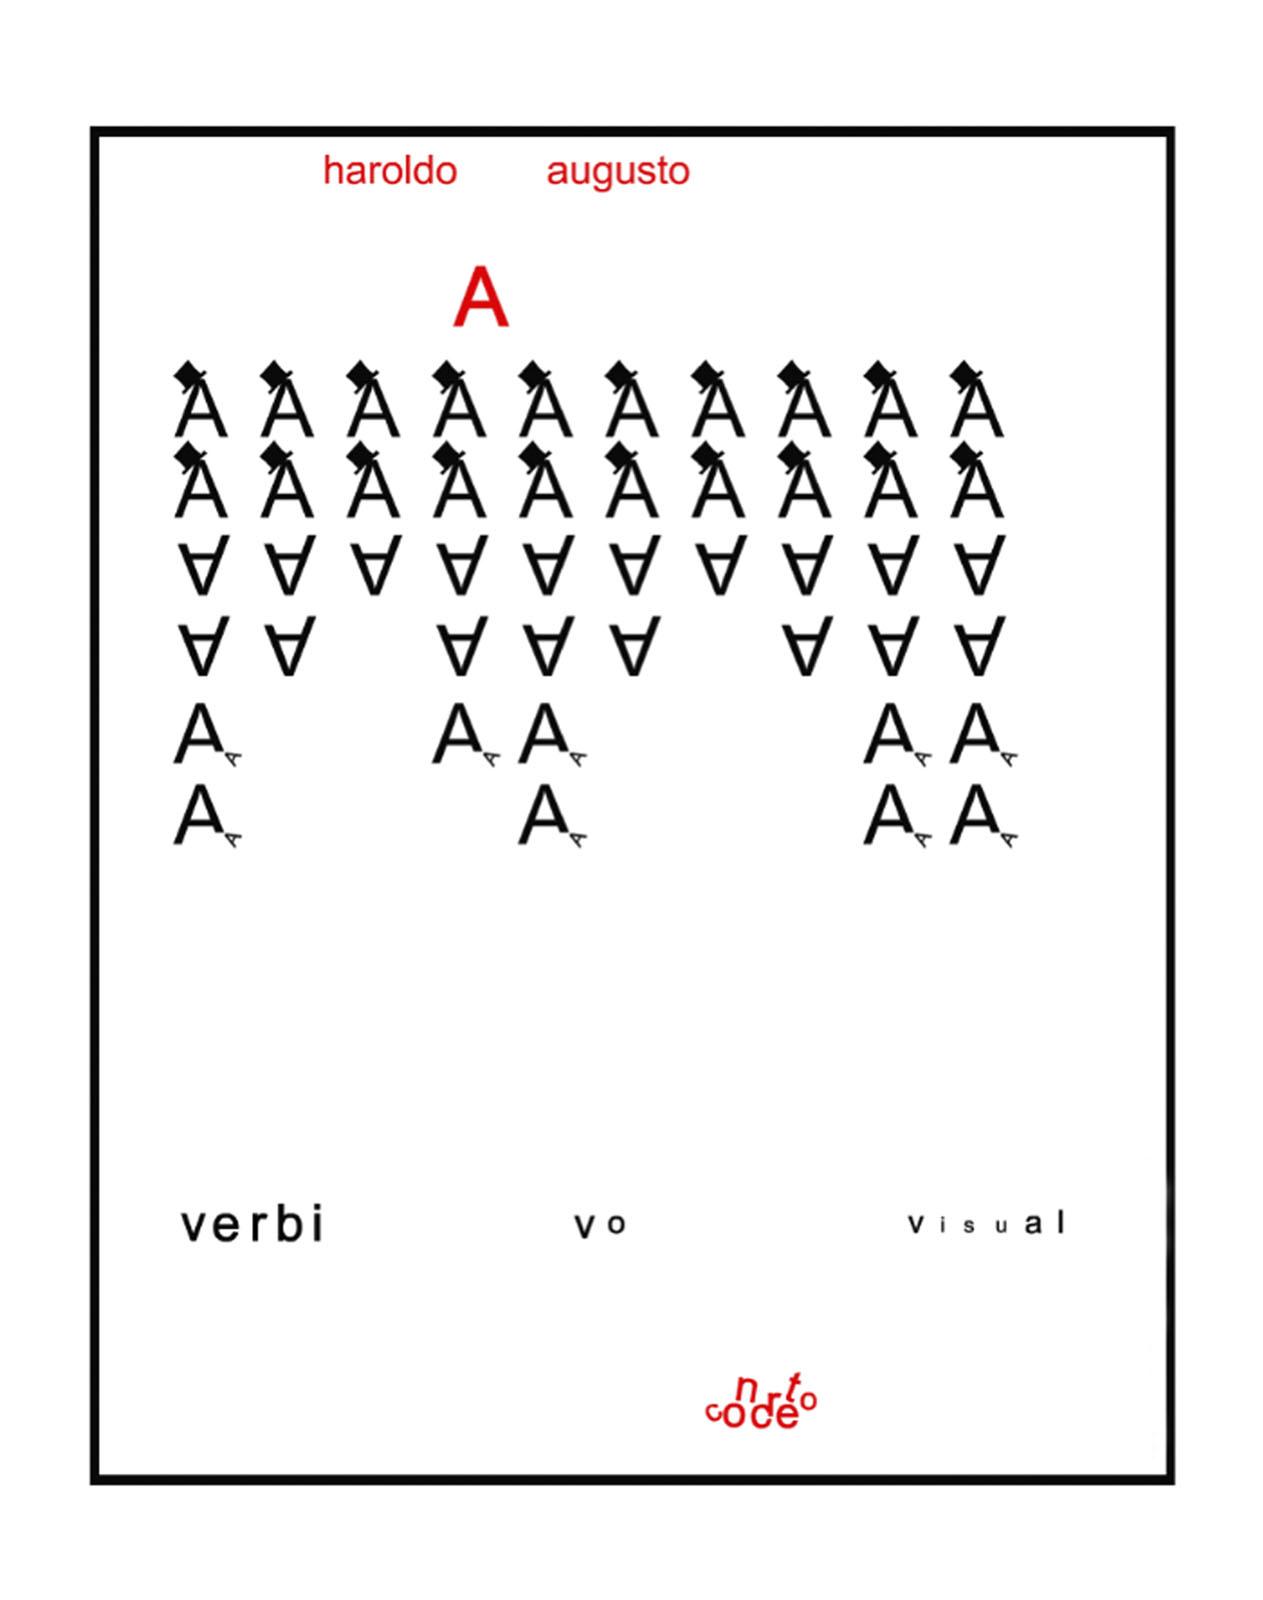 poesia-digital-concretoons-benjamin-moreno-1